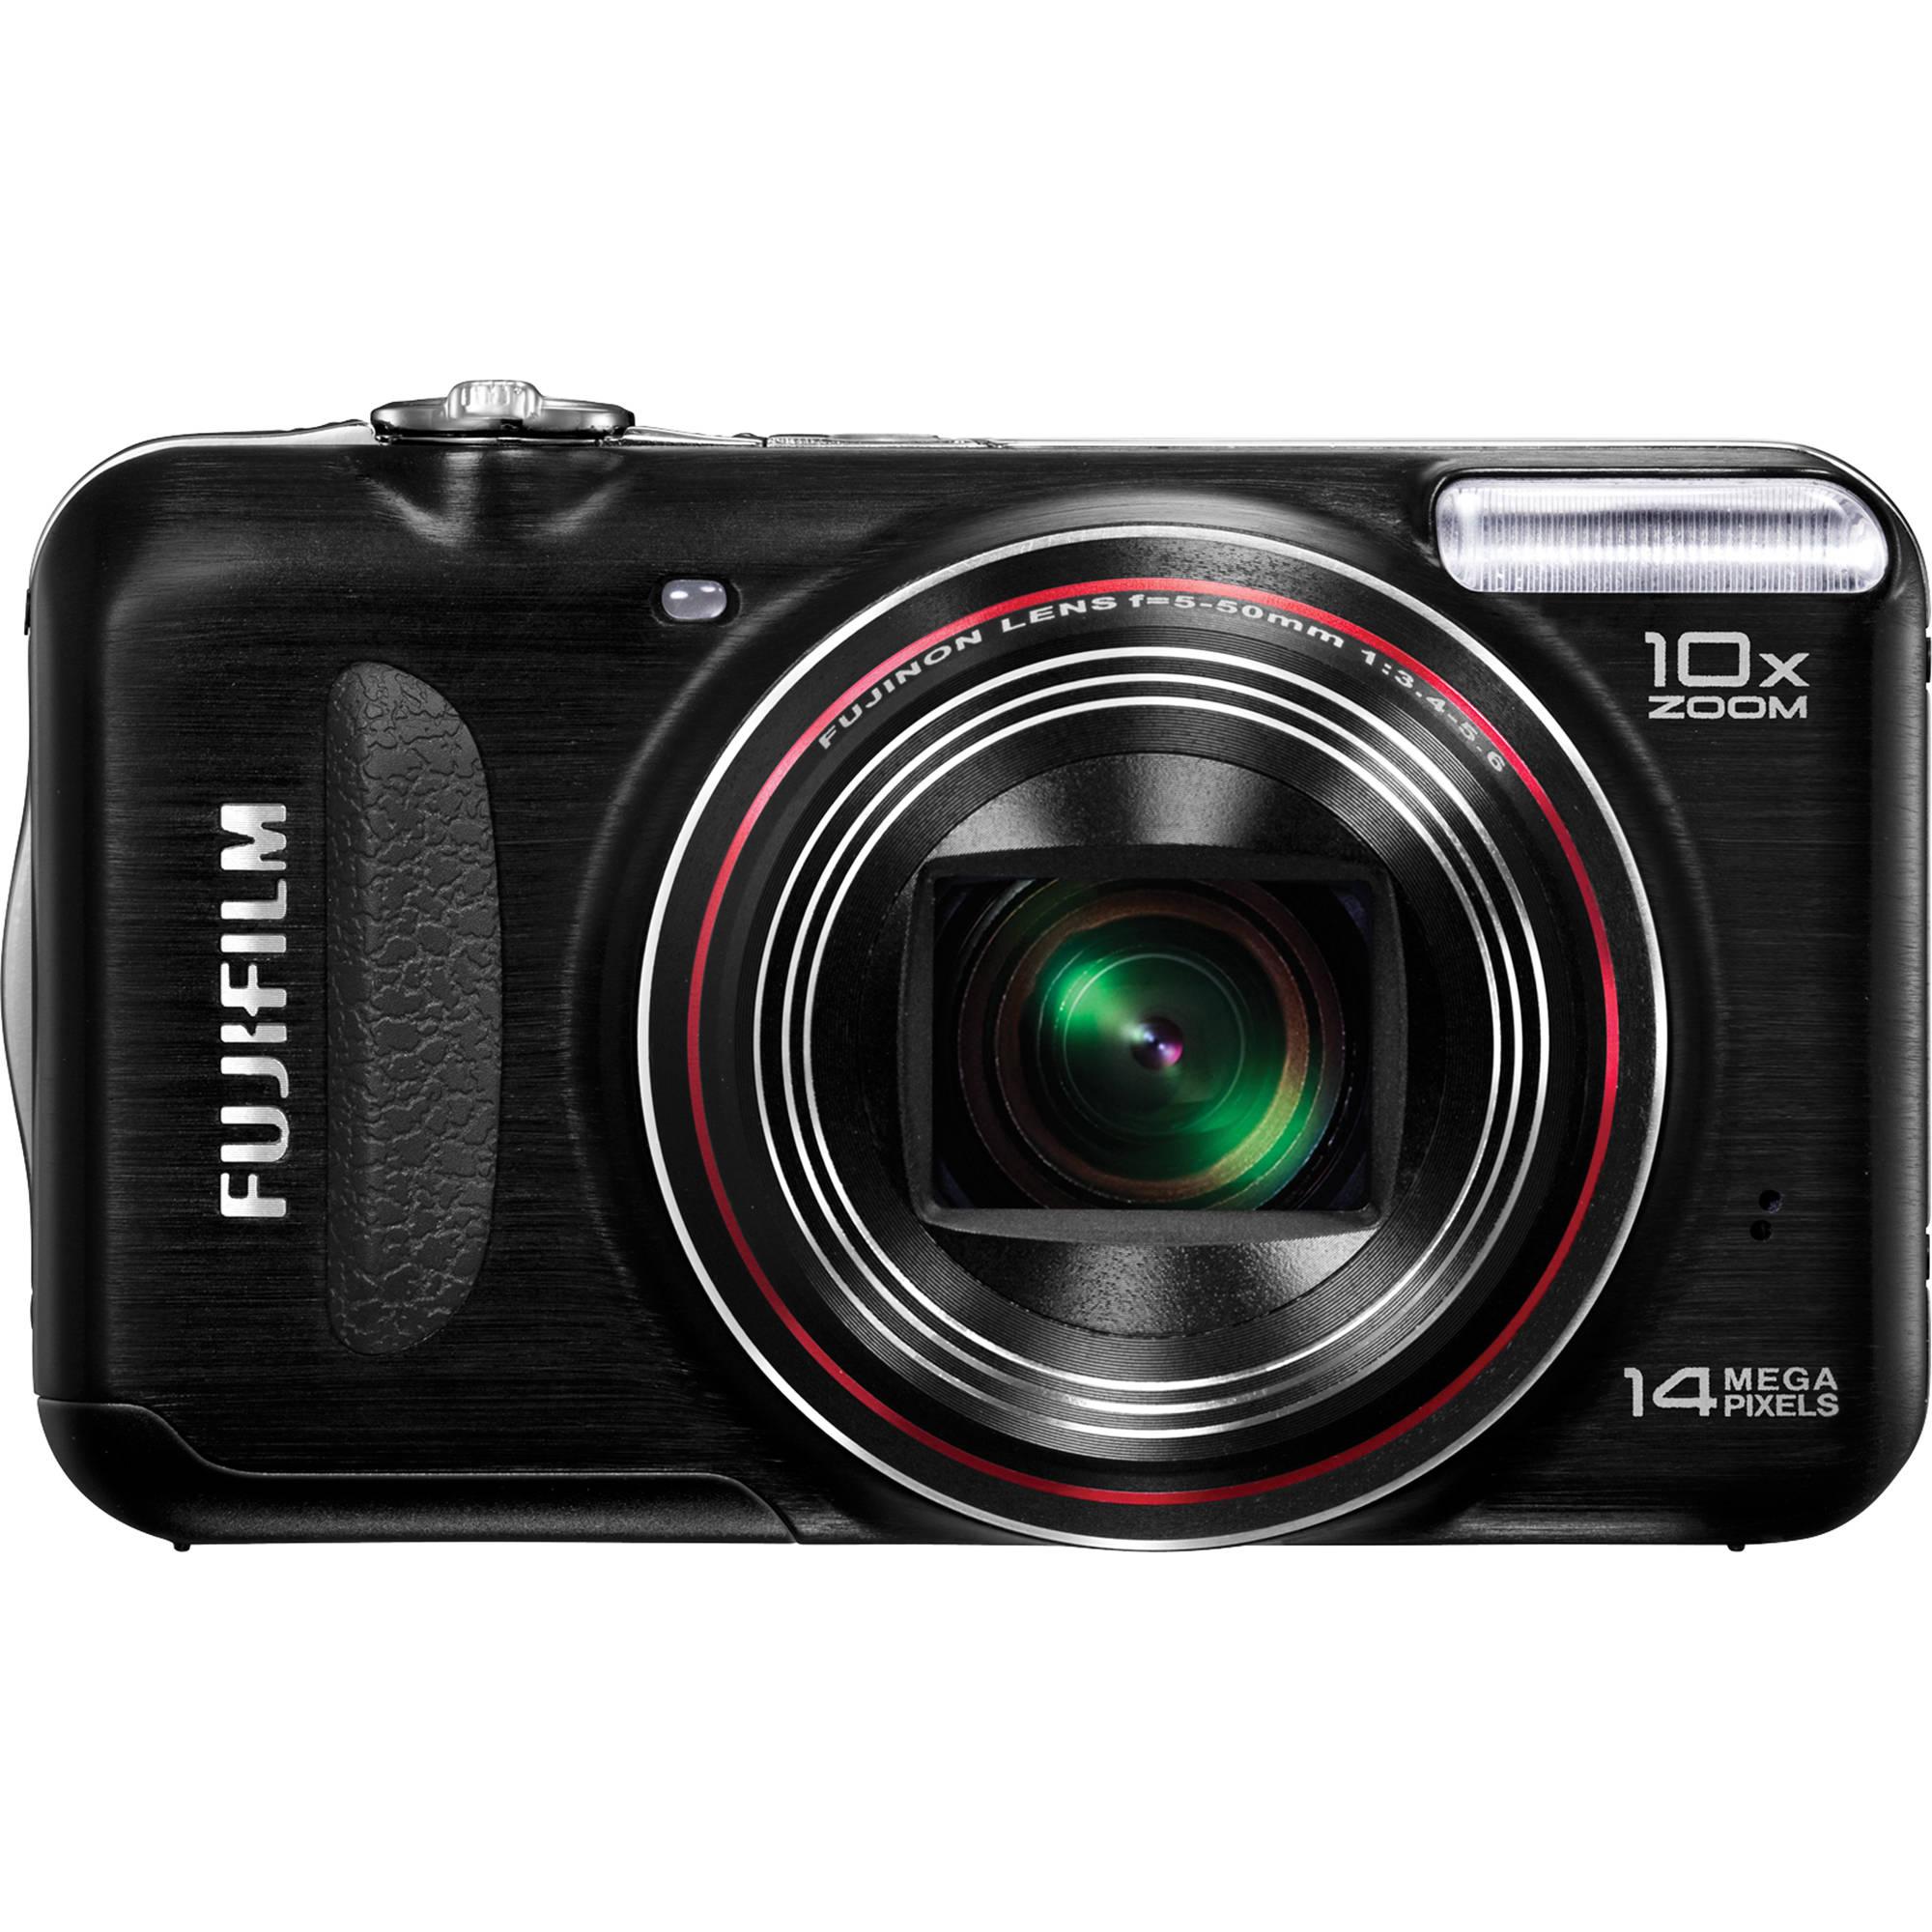 Fuji Digital Cameras: FUJIFILM FinePix T300 14MP Digital Camera (Black) 16131679 B&H